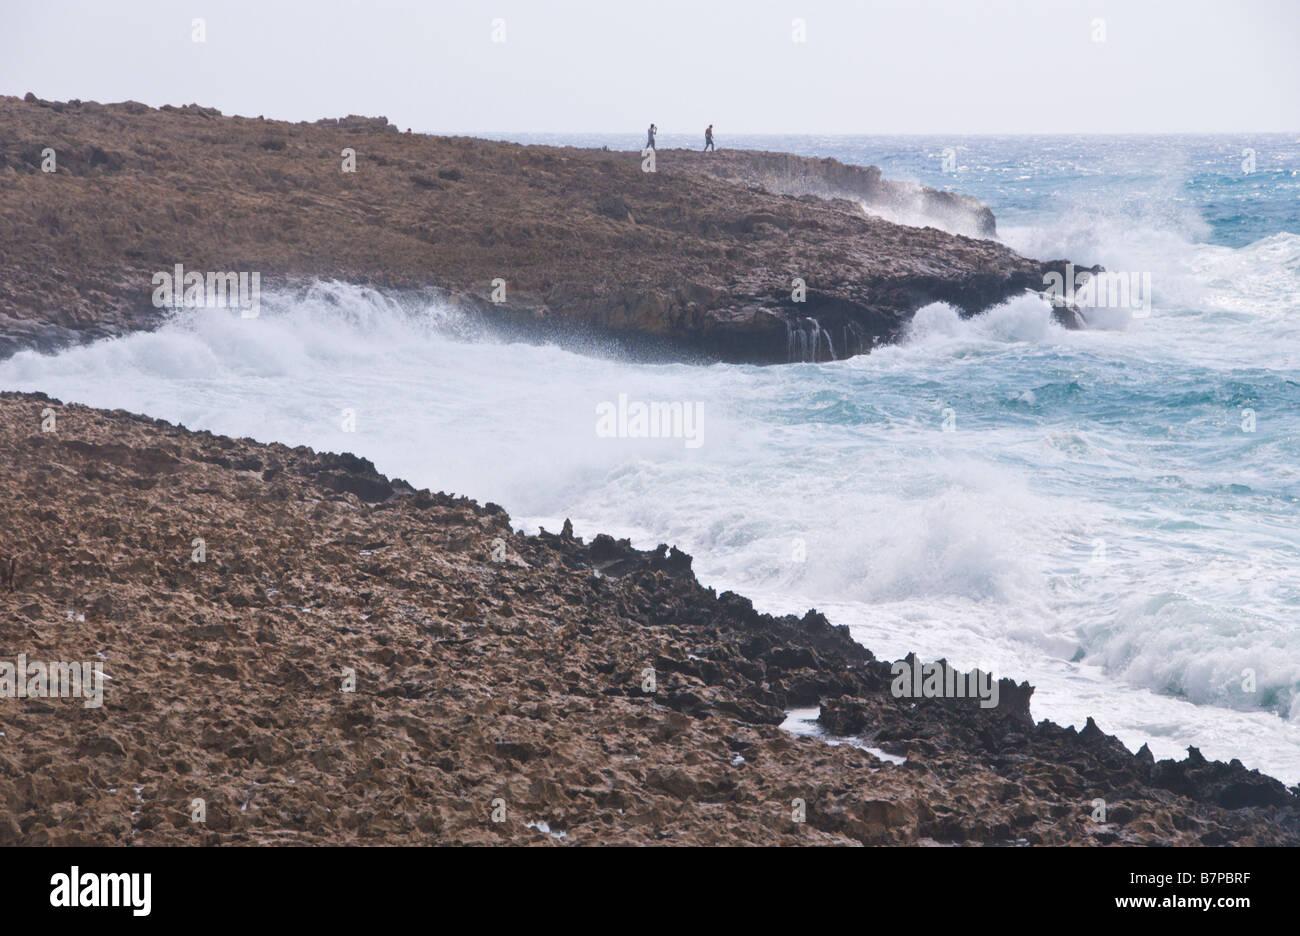 Large waves crash onto rocks in high winds near Ayia Napa on the Eastern Mediterranean island of Cyprus EU - Stock Image